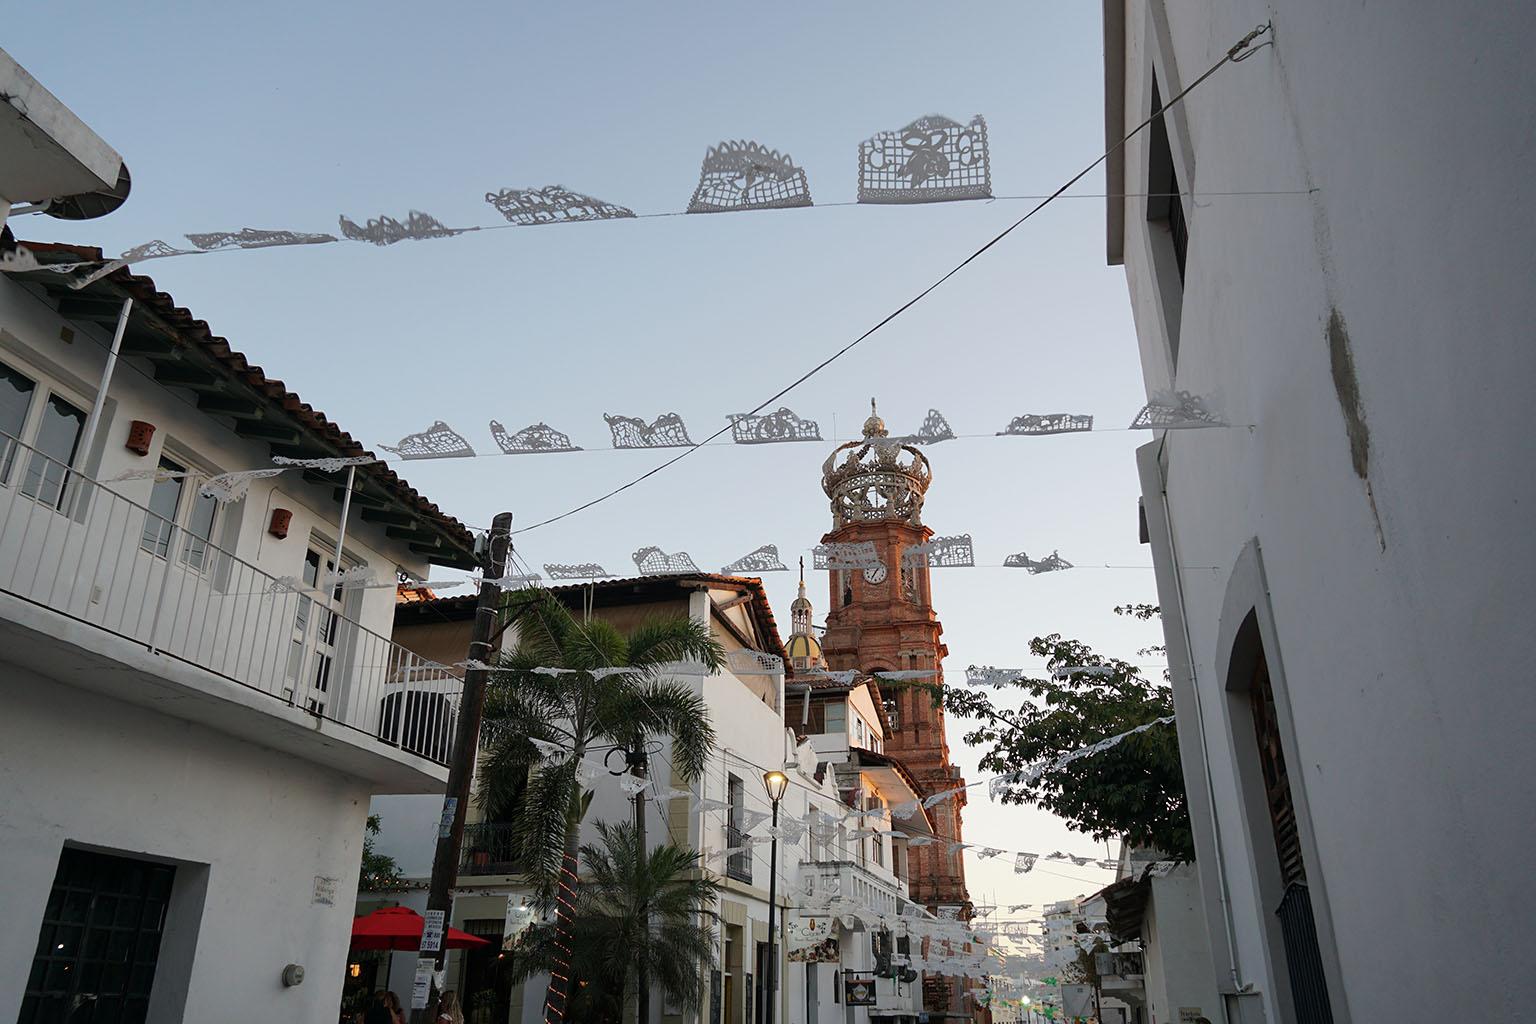 Charming downtown Puerto Vallarta